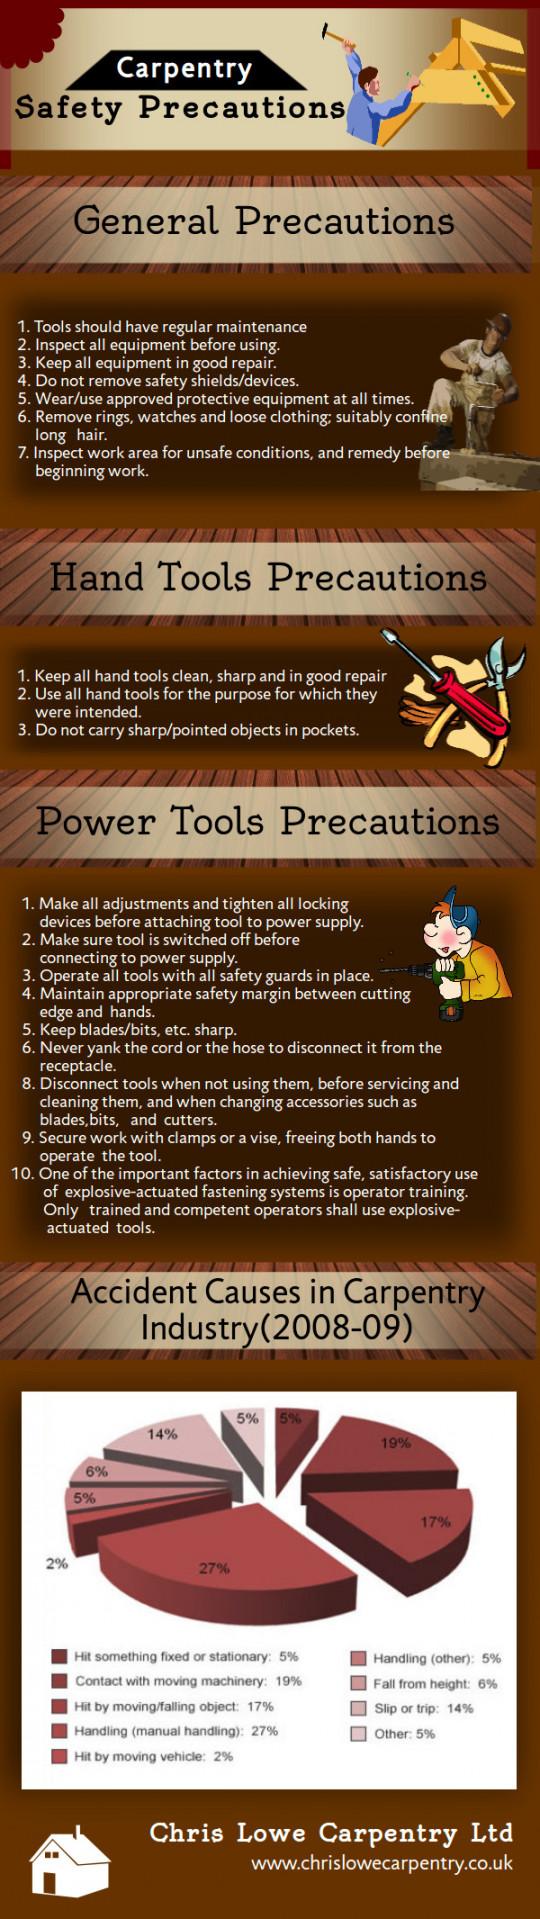 Carpentry Safety Precautions